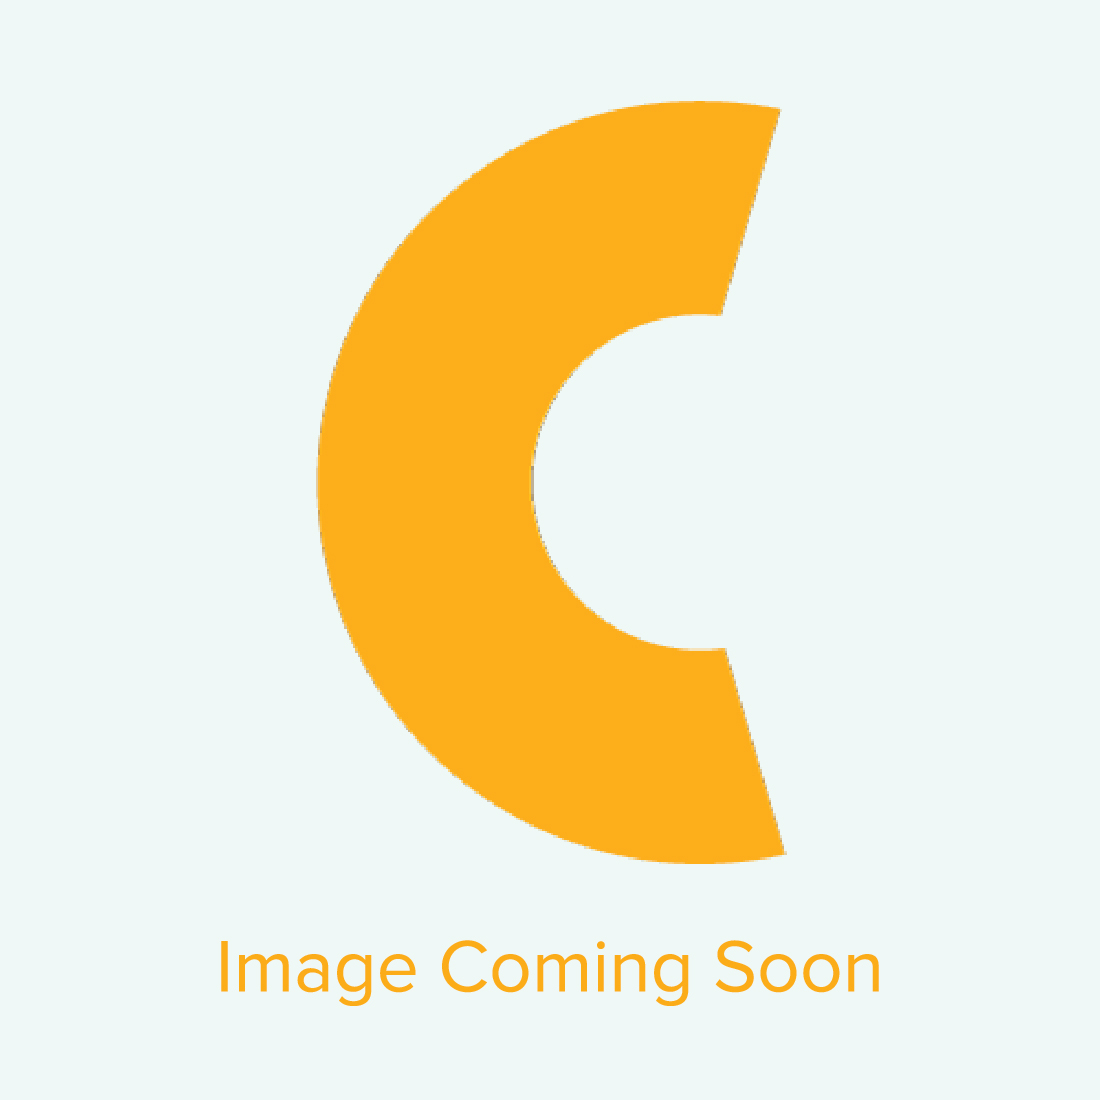 "Vivalux LTX Heavy Latex Backlit Film – 280 gsm – 54"" x 100' - CLEARANCE"